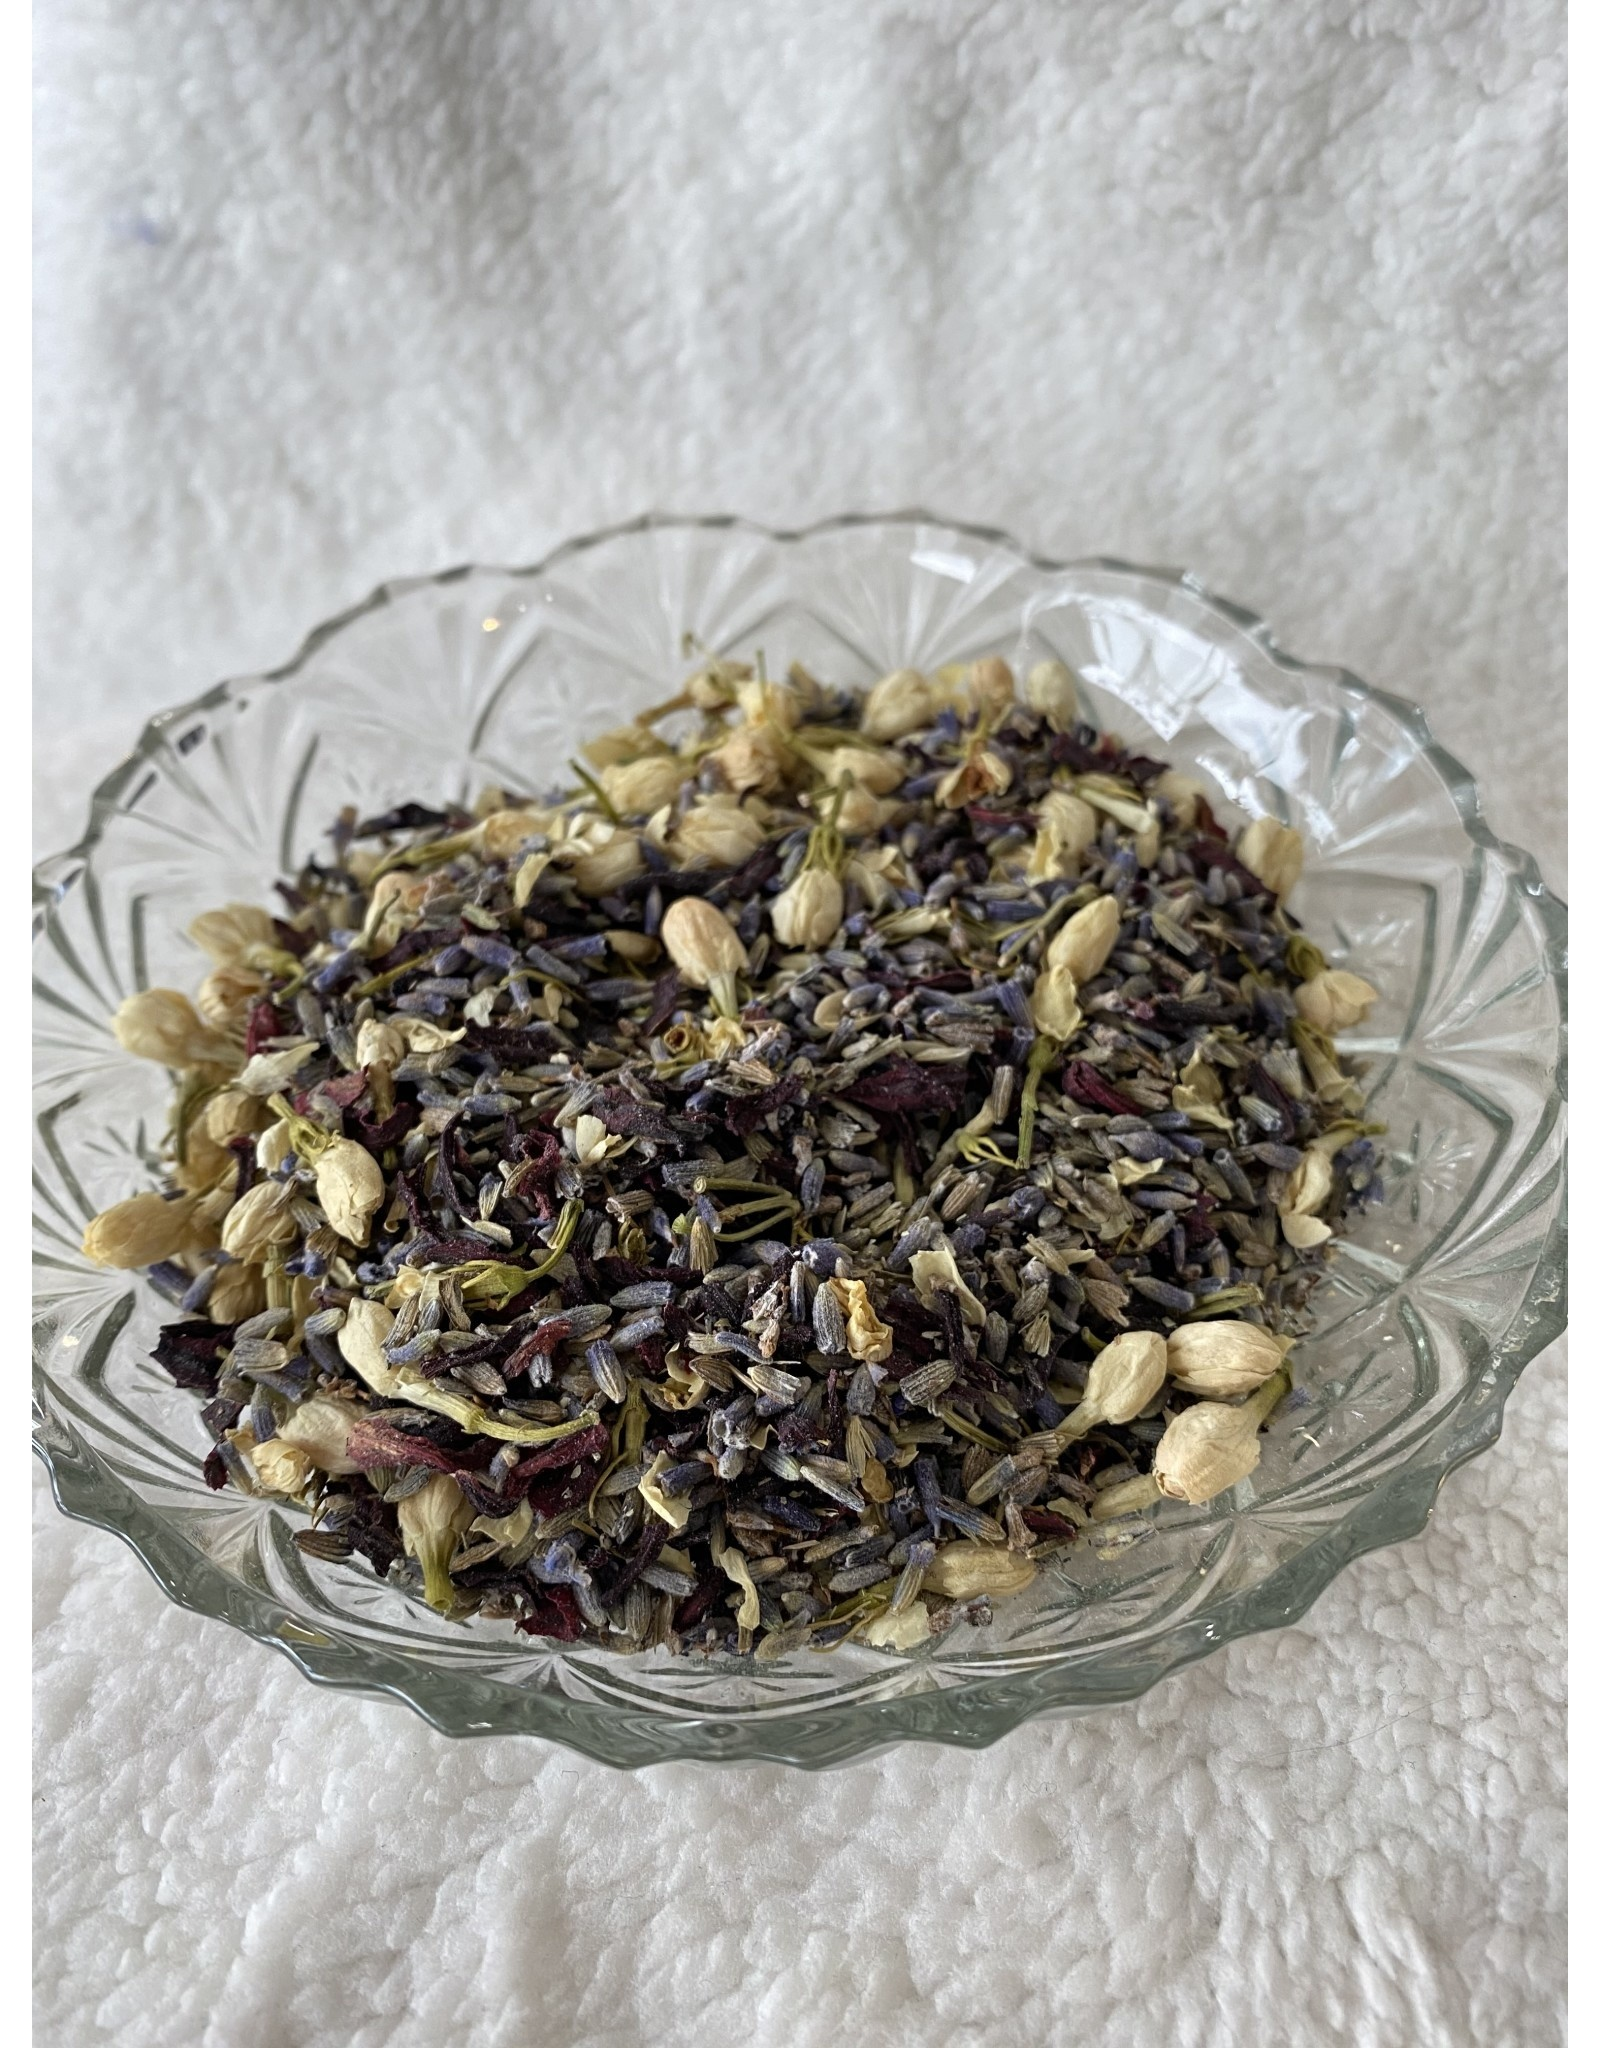 Flower Tea & Bath Blend - 1 oz.